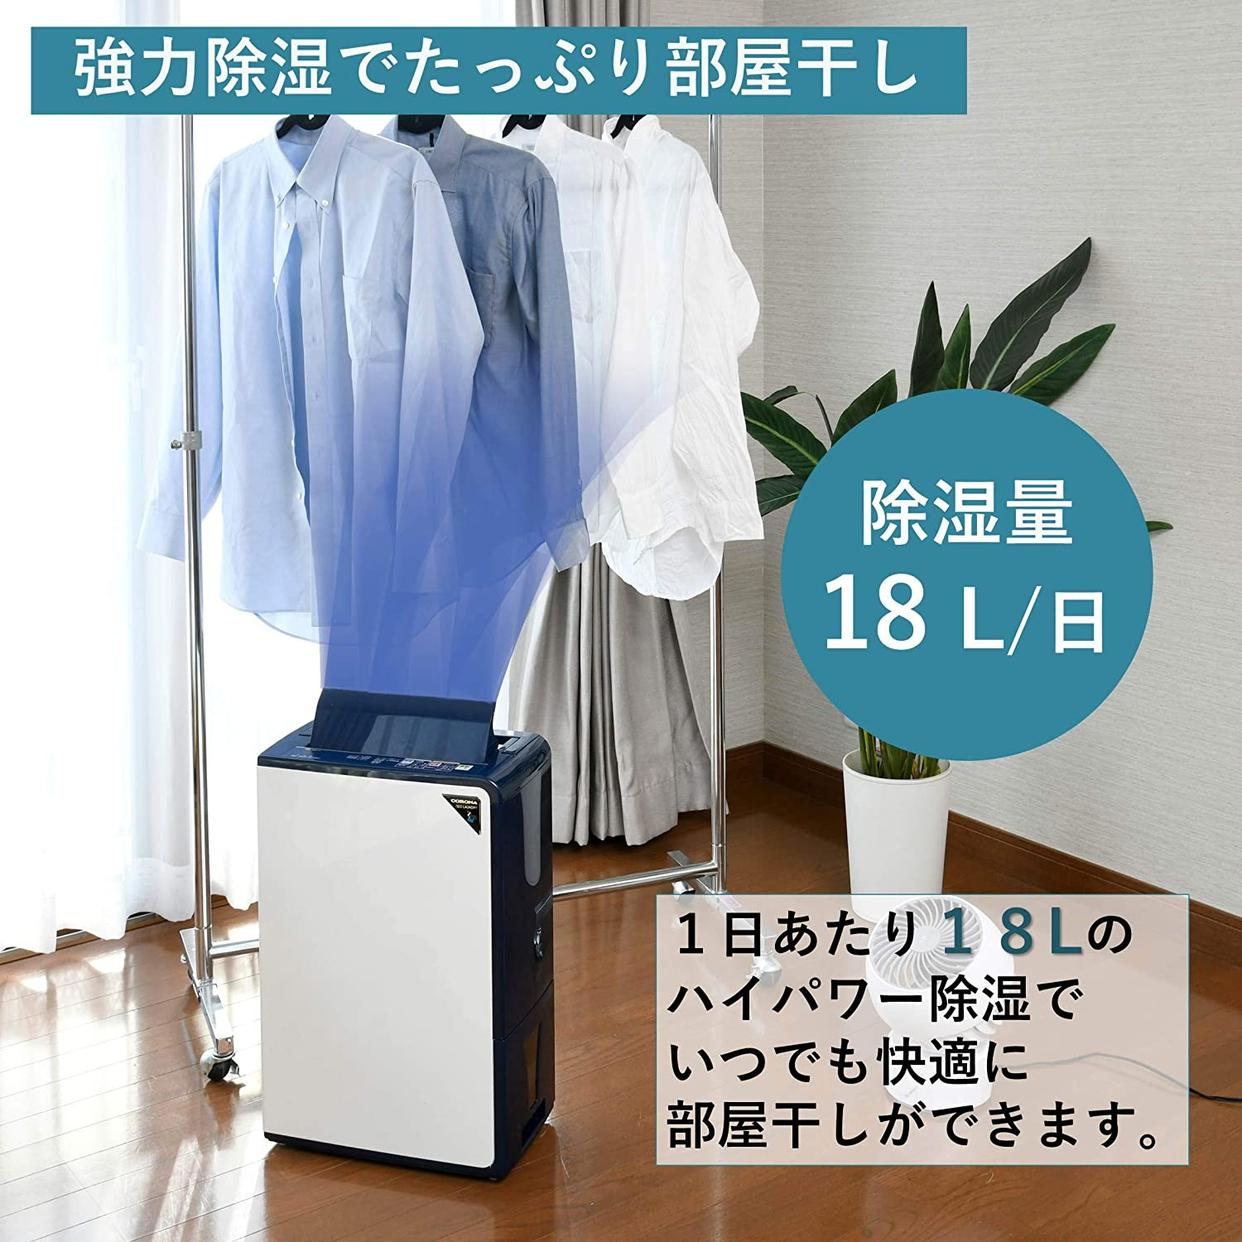 CORONA(コロナ) 衣類乾燥除湿機 CD-H1818の商品画像3